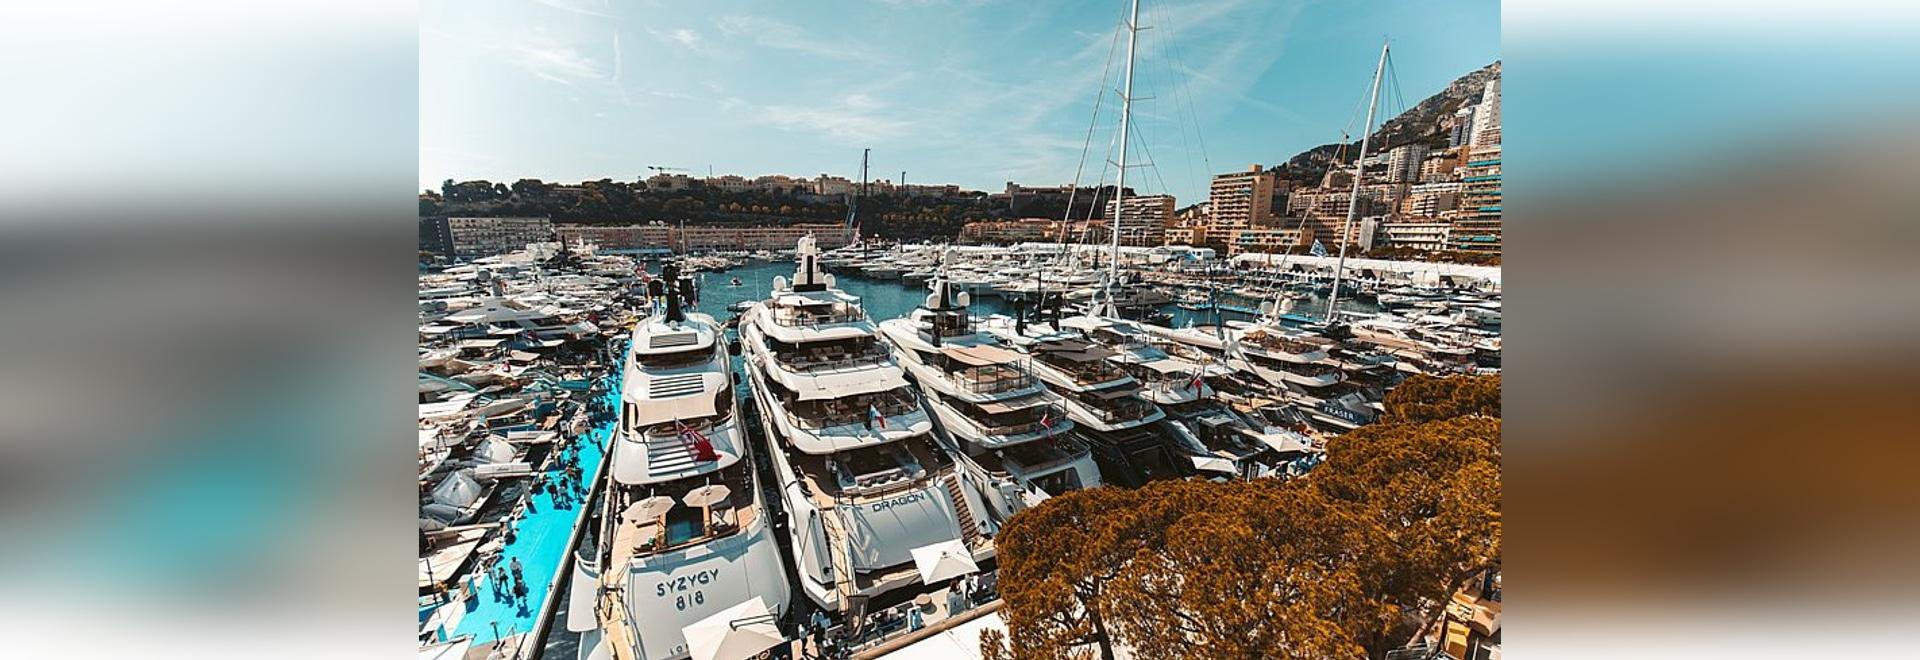 Informa cancels Monaco Yacht Show 2020